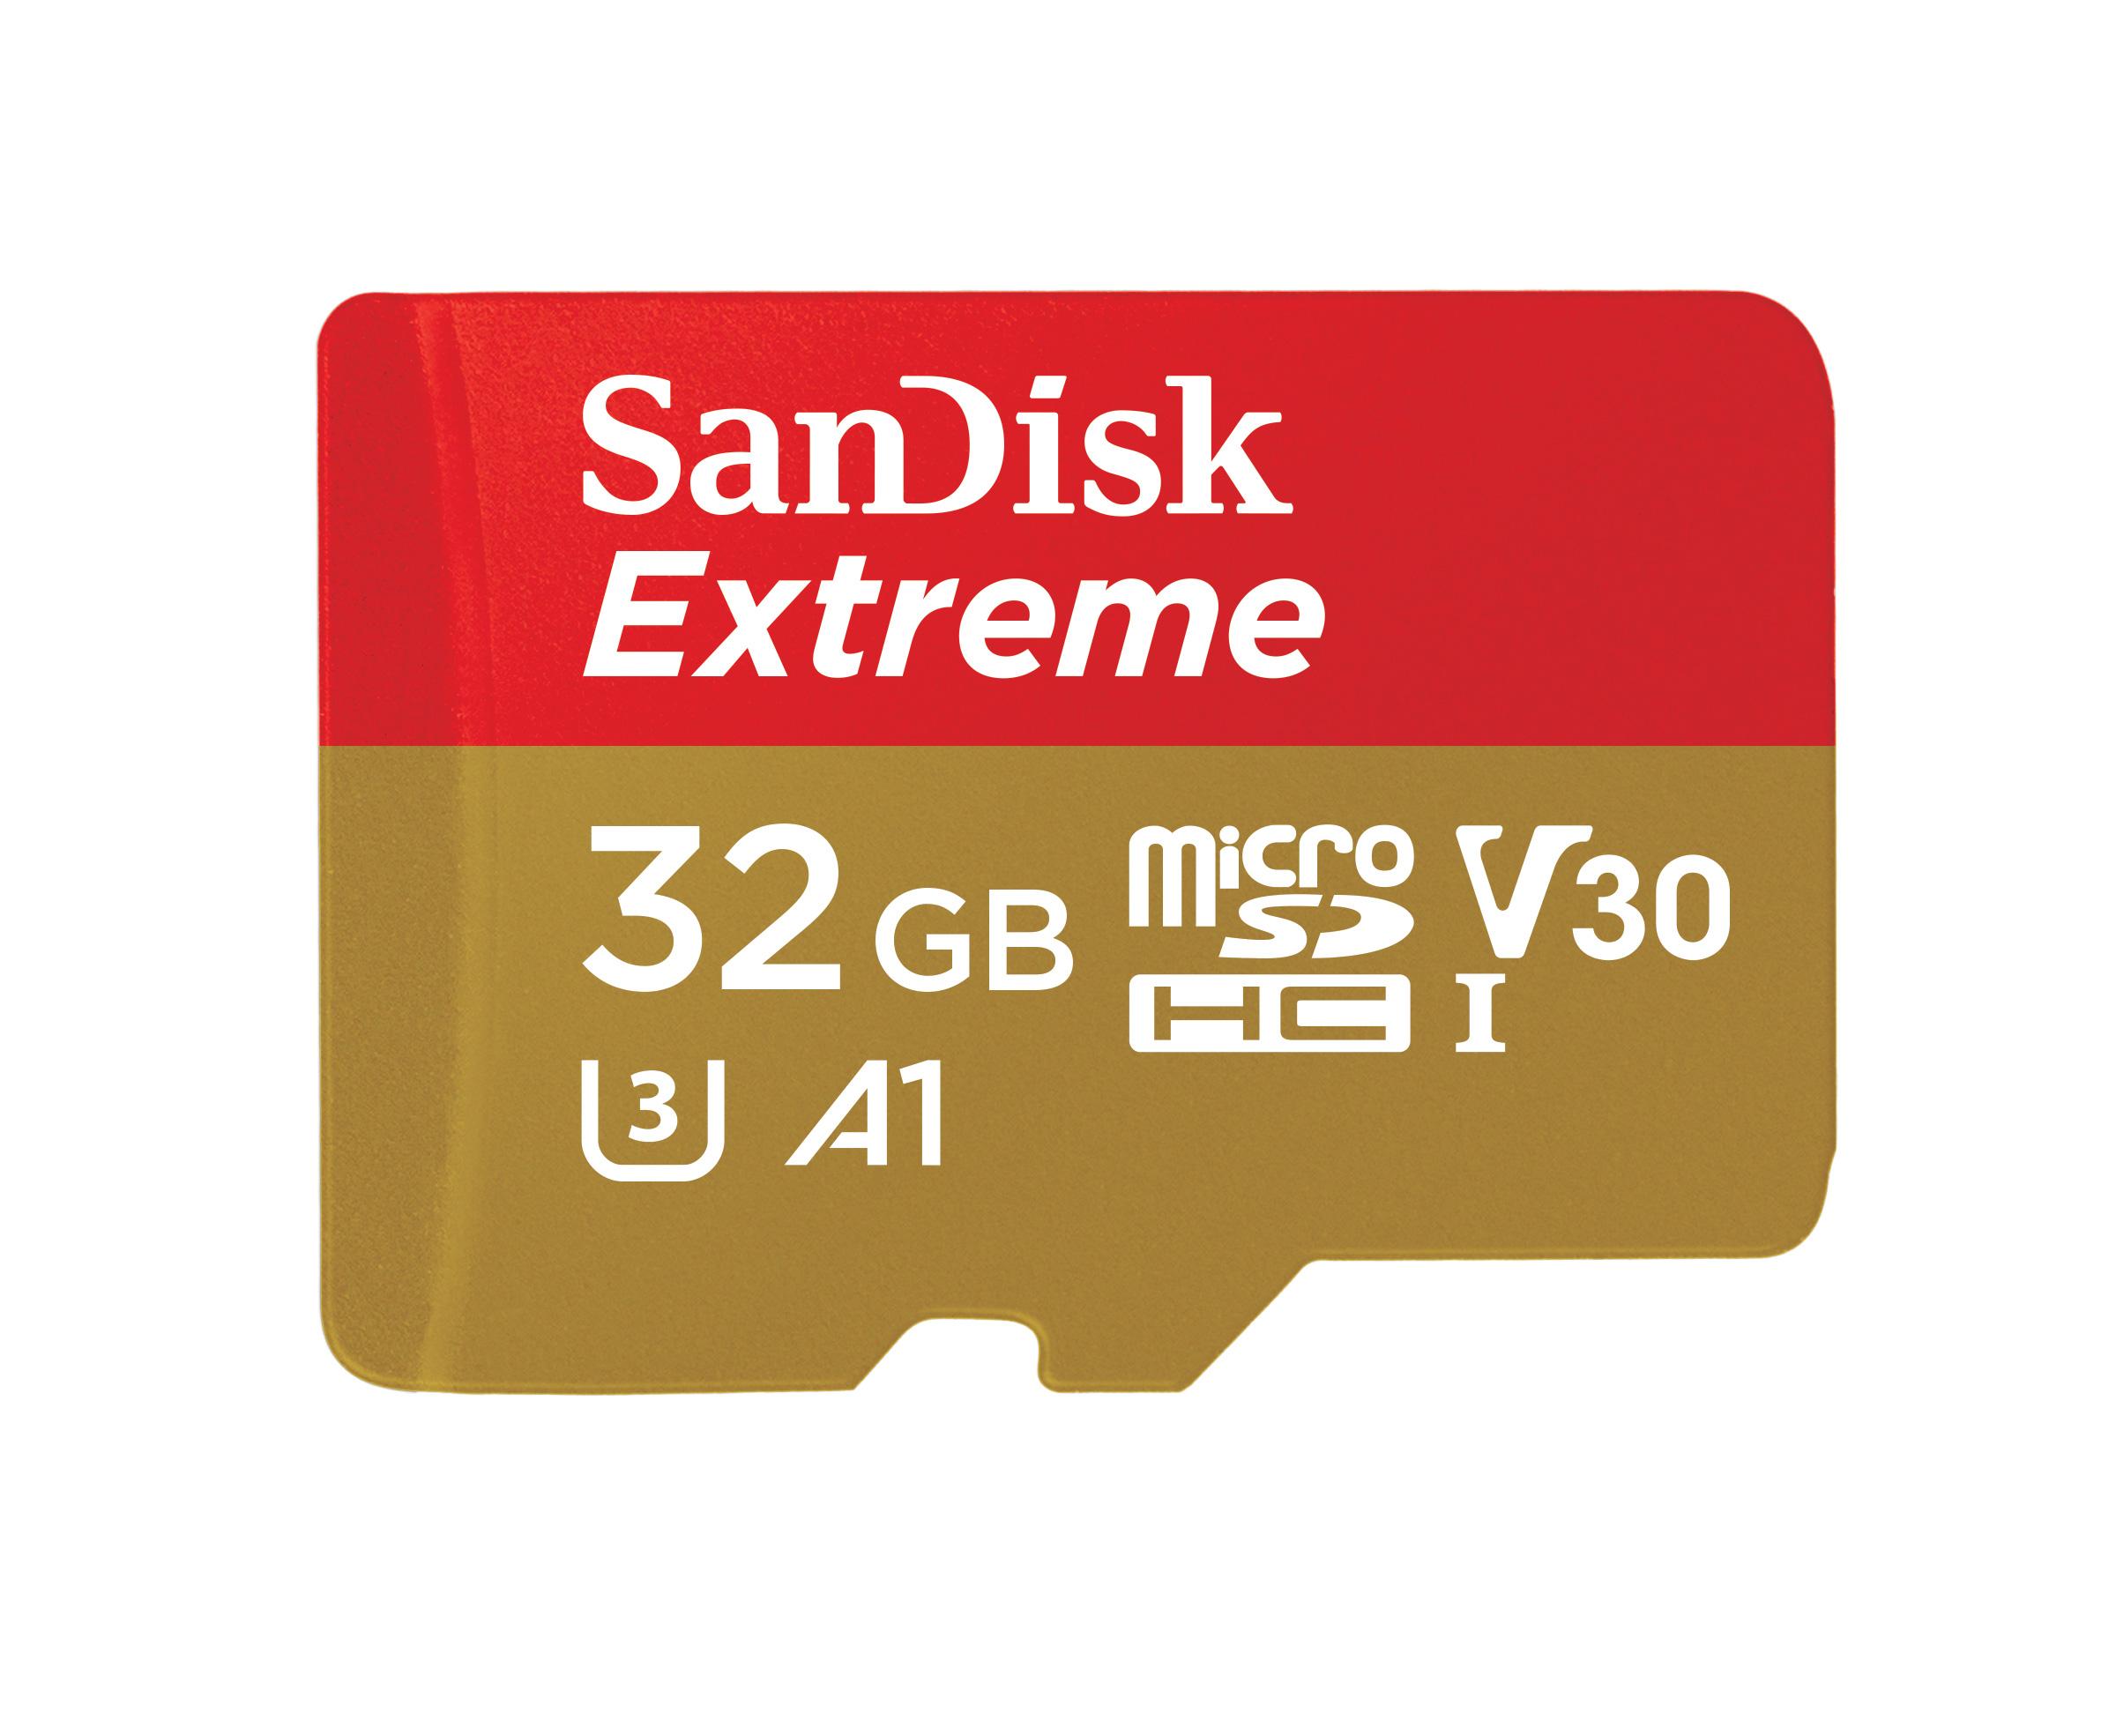 SanDisk Extreme PLUS U3 V30 Class 10 32GB microSD Card $5 Walmart YMMV